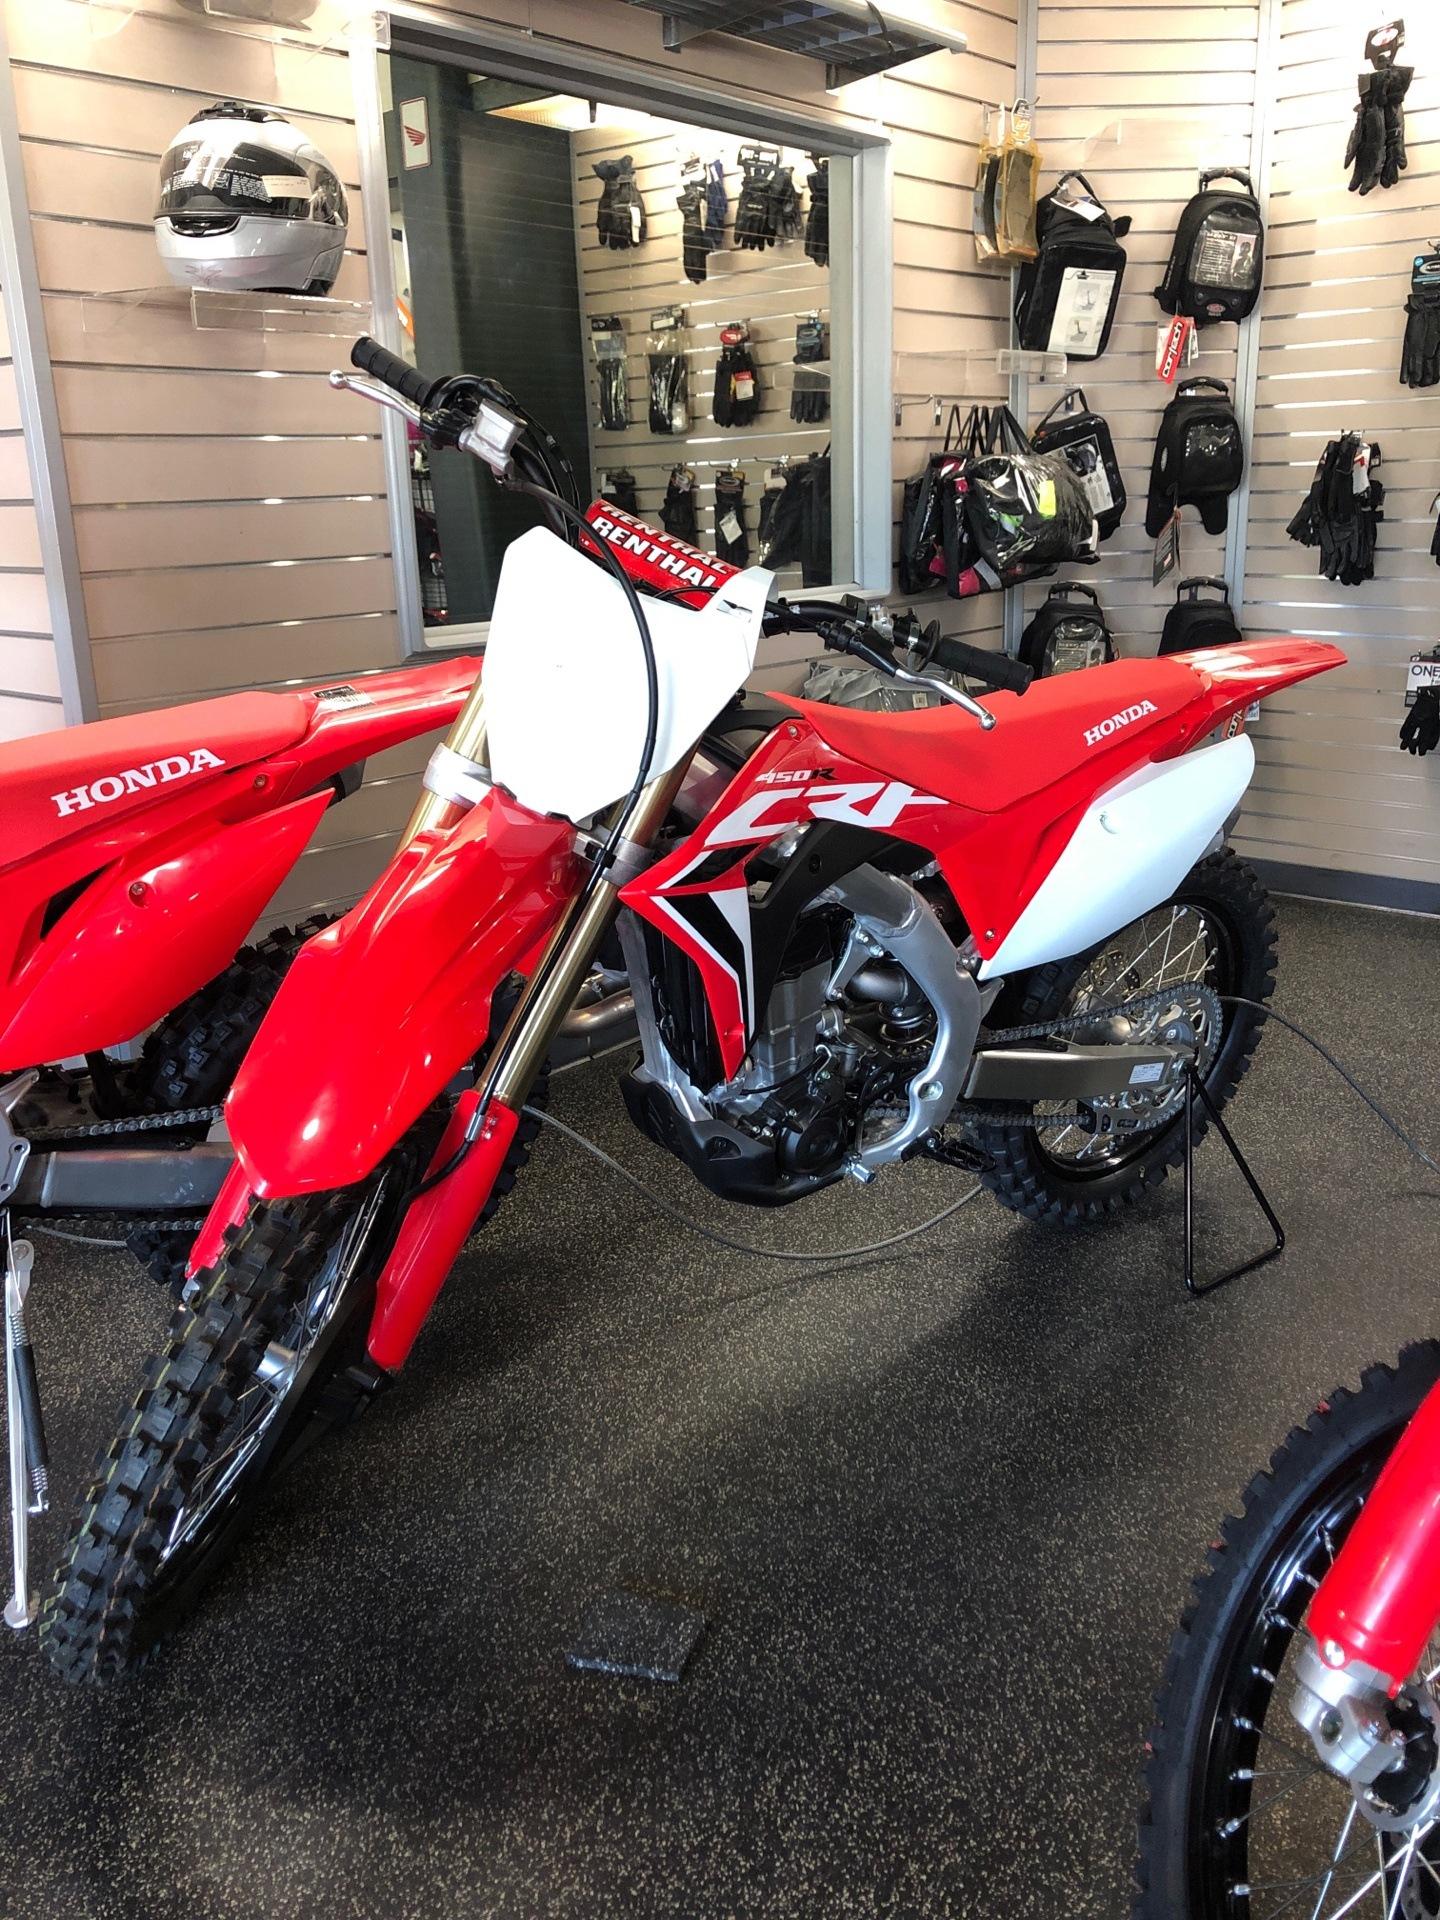 2021 honda crf450r red motorcycles lafayette louisiana temp